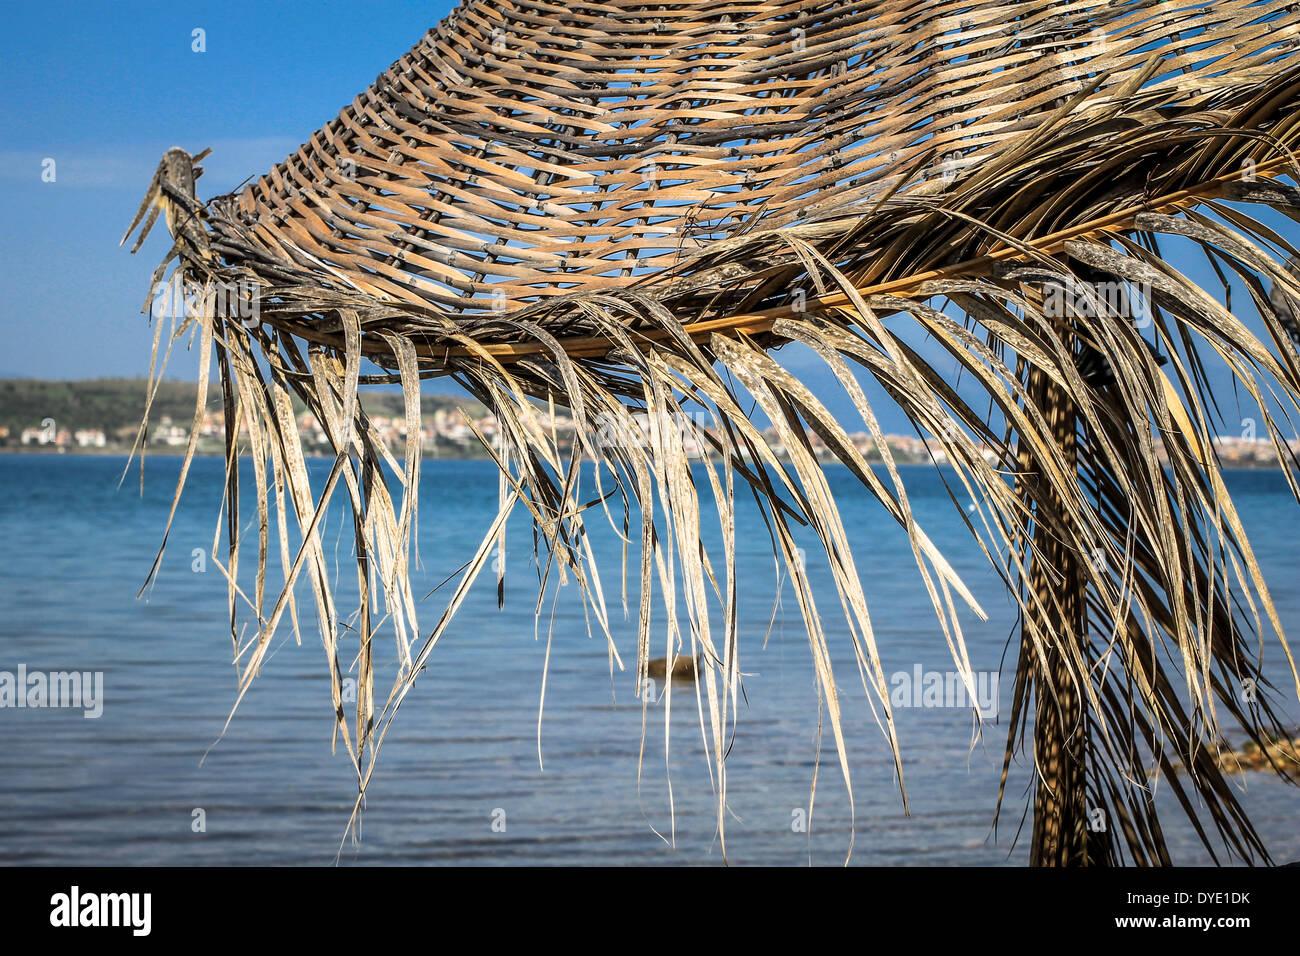 Straw umbrella with blue sea background - Stock Image